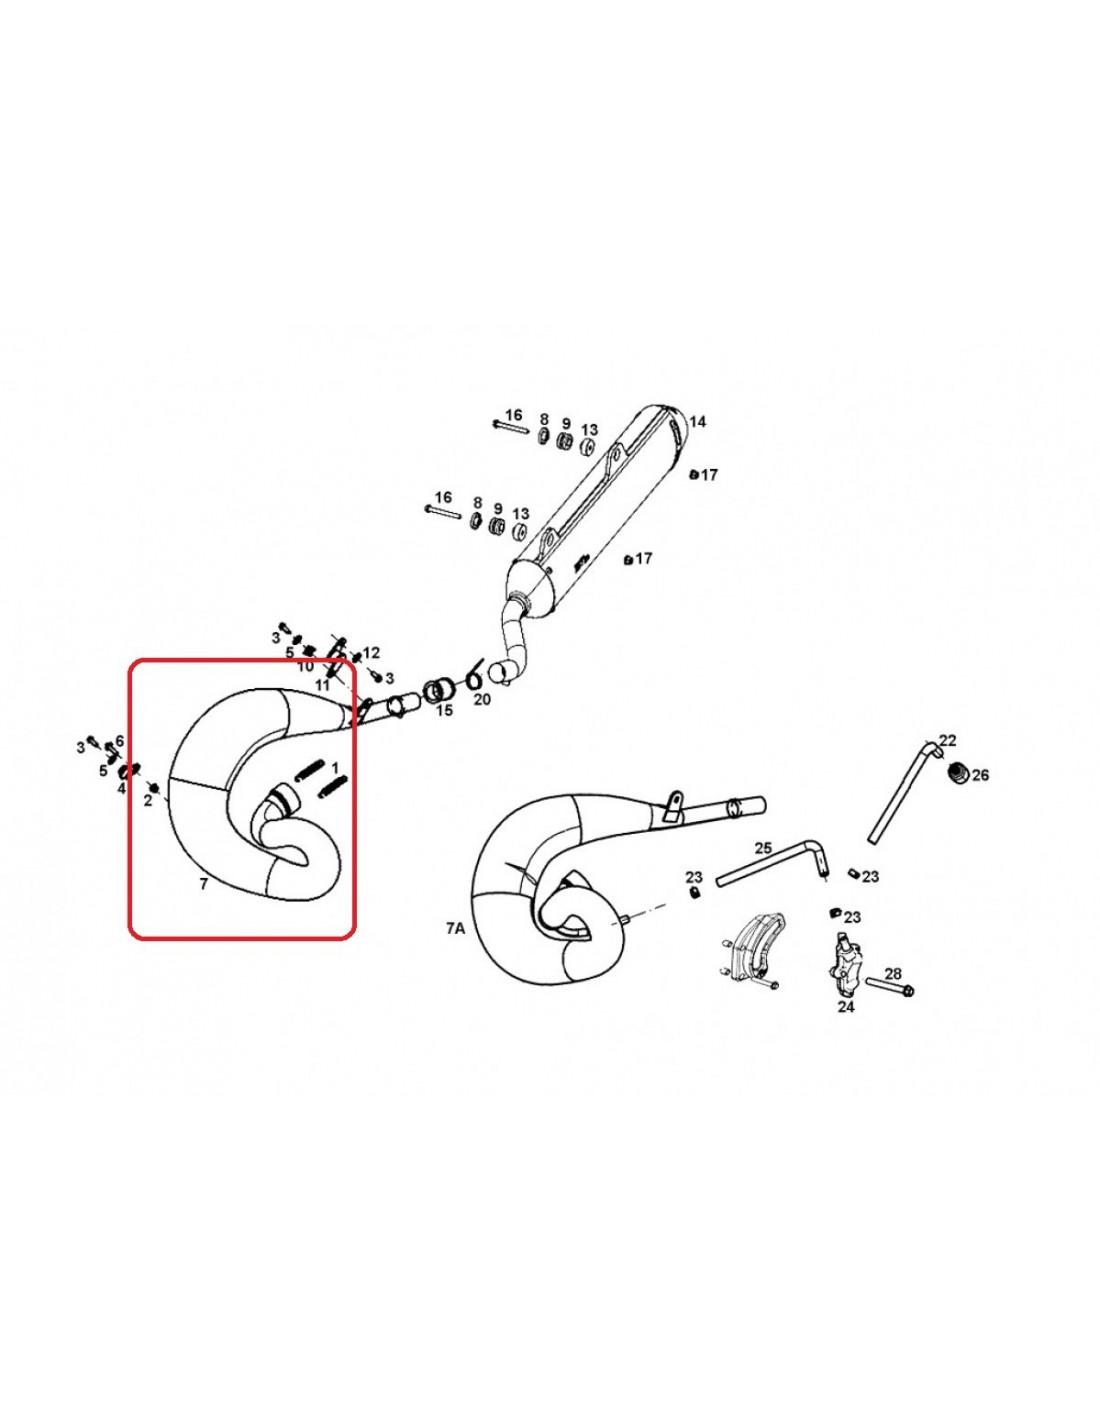 BUFANDA GAS GAS EC 200/250/300 14-17